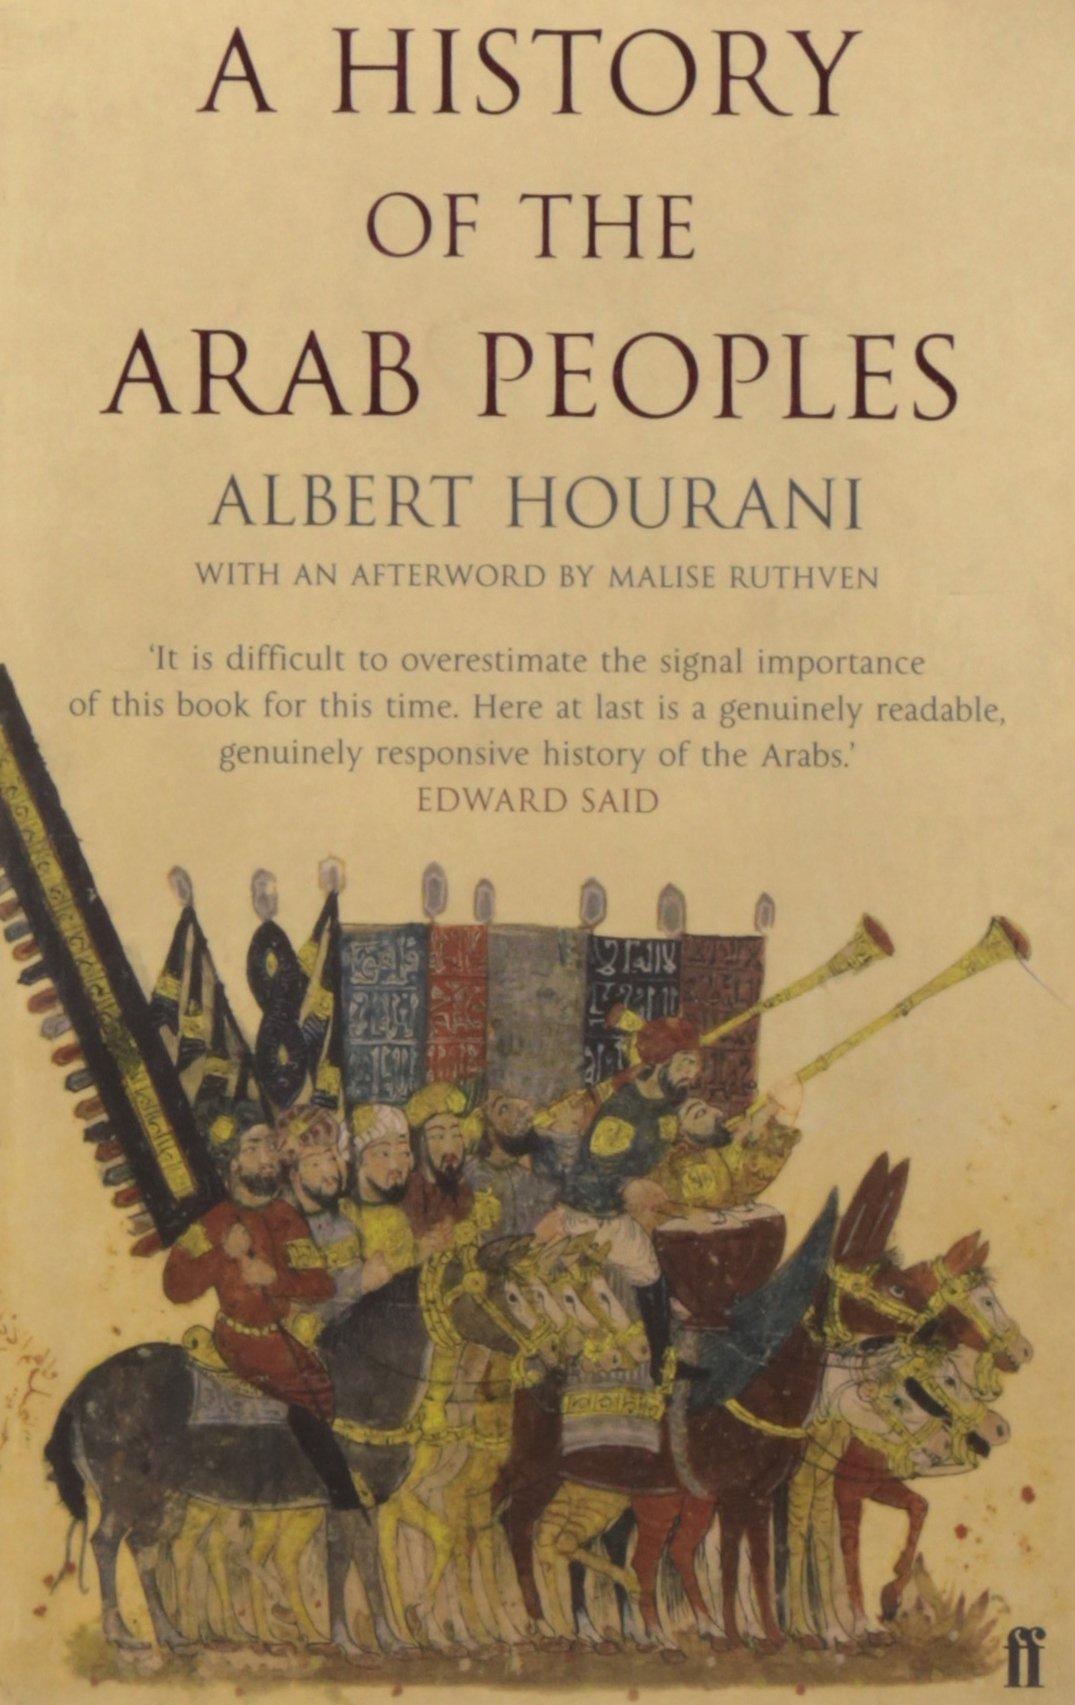 A History of the Arab Peoples by Albert Hourani.jpg